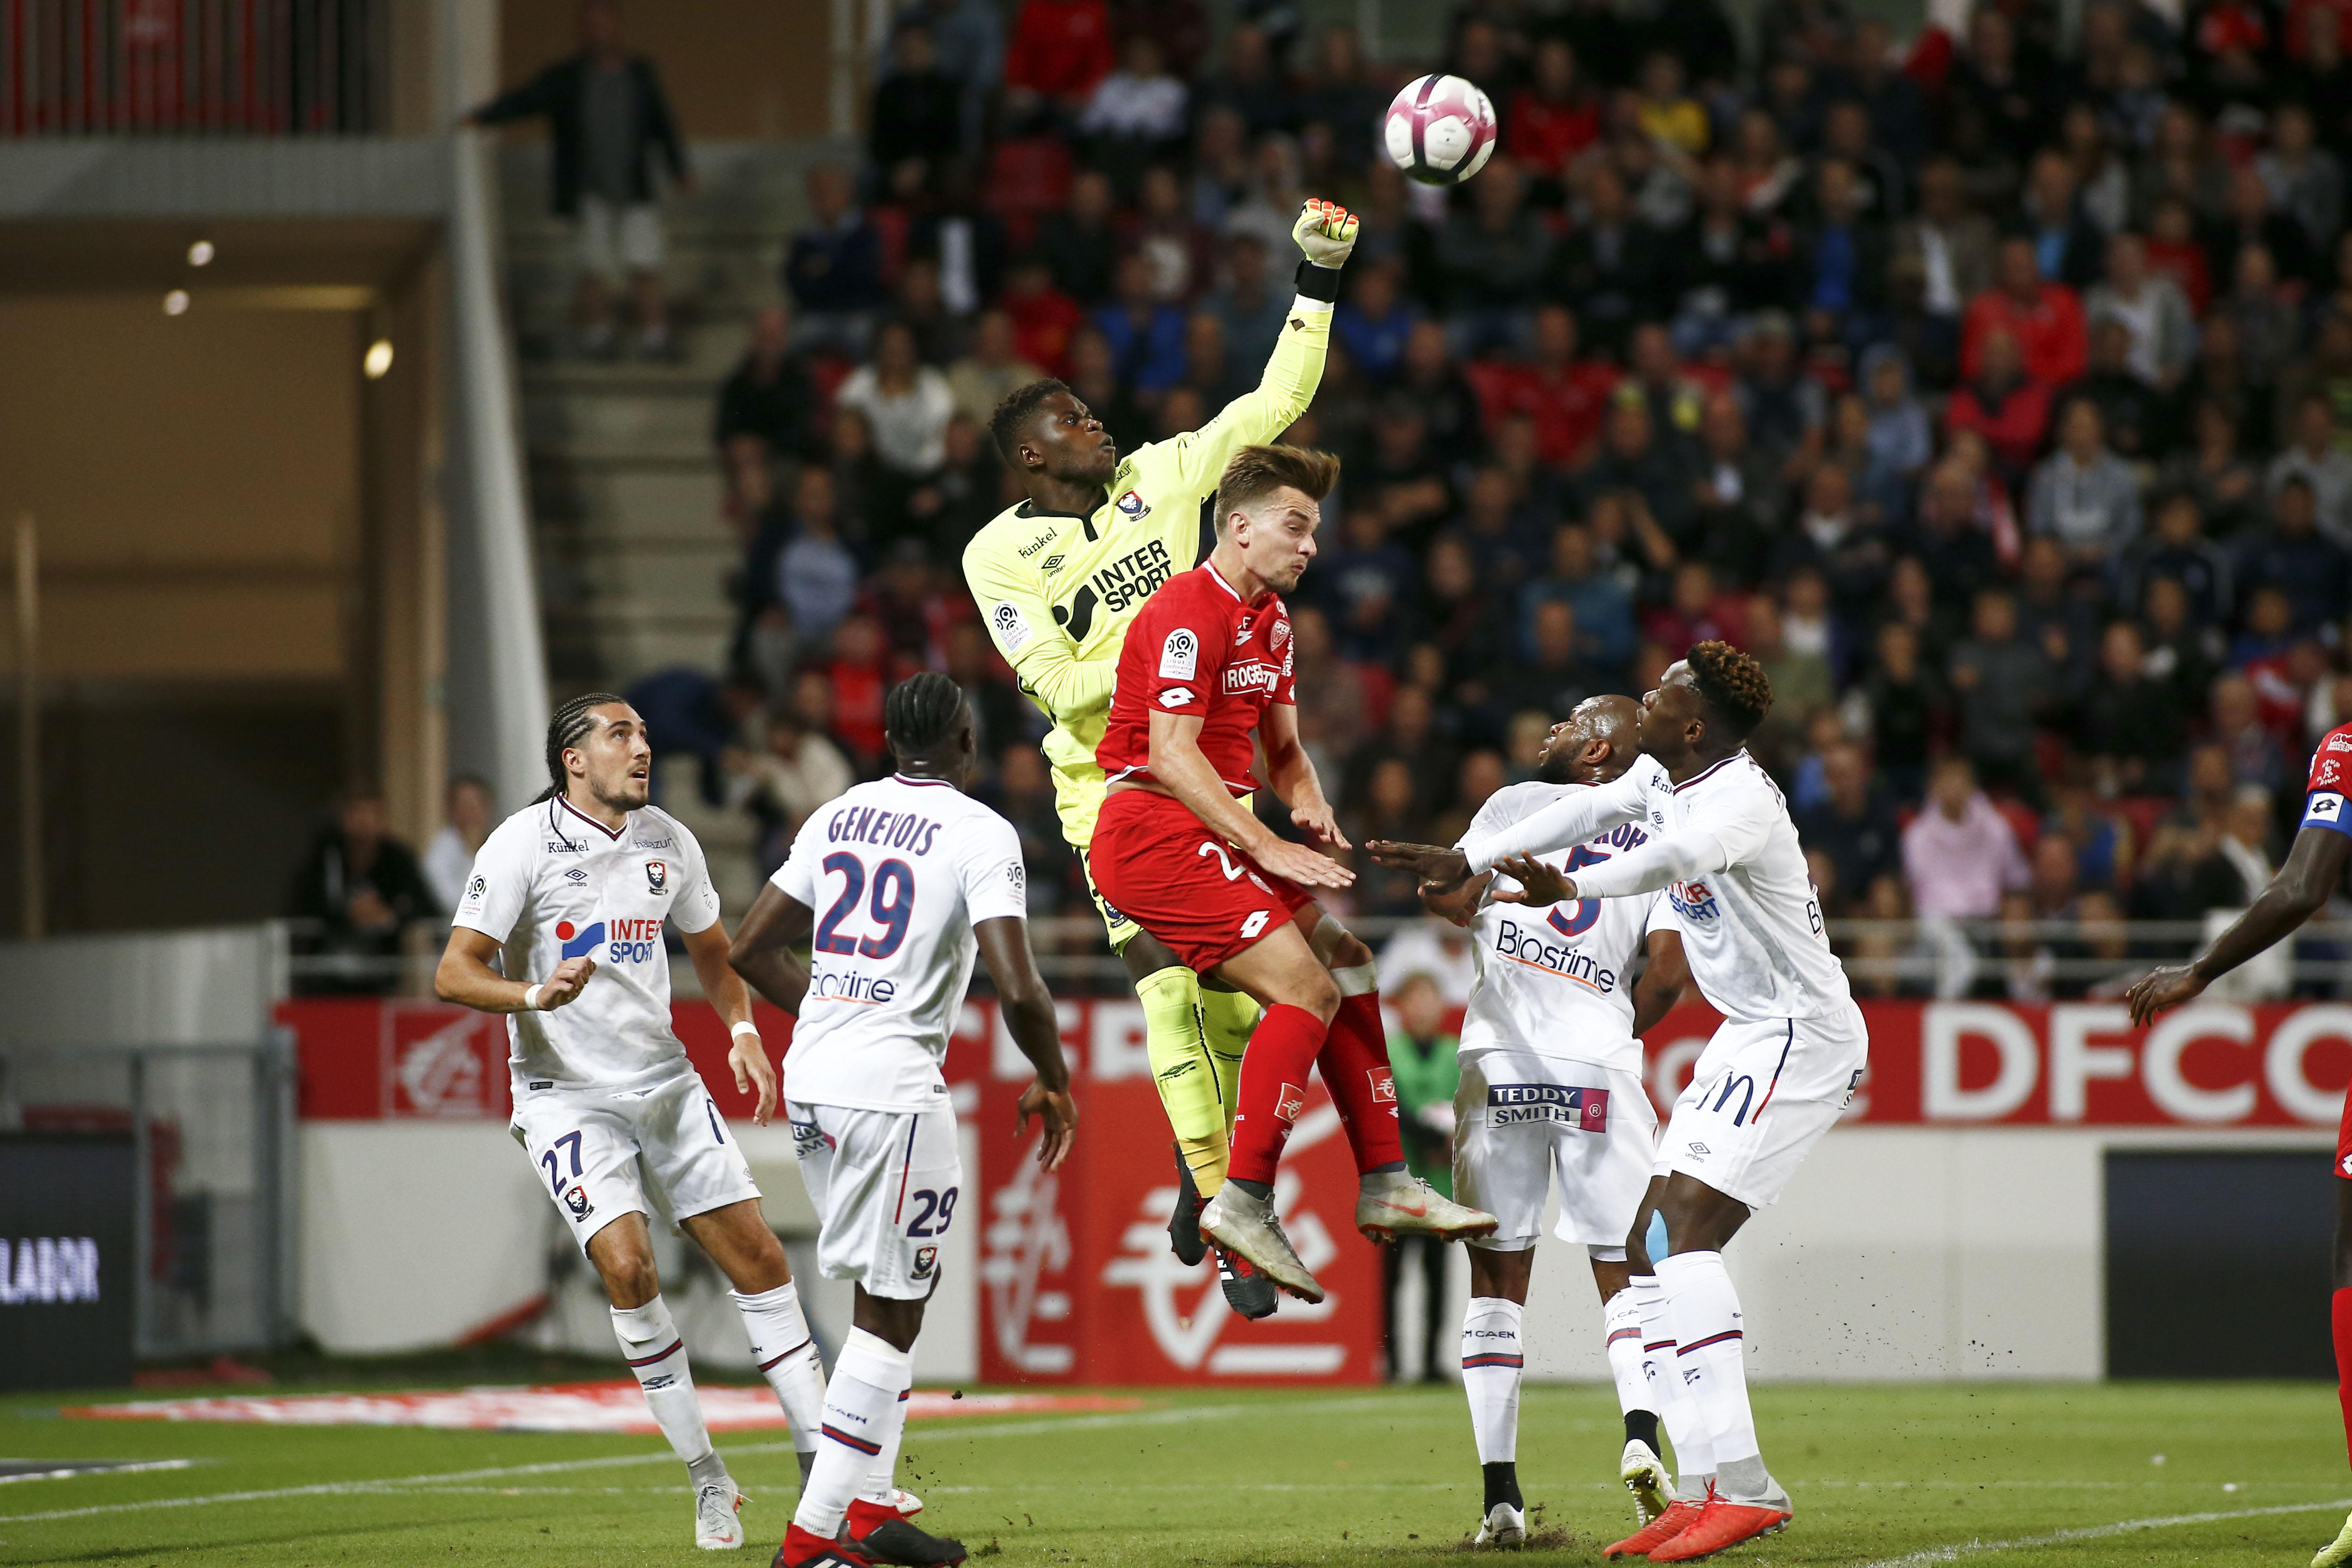 Football - Ligue 1 - Caen-Dijon, match de la peur ou du fol espoir ?